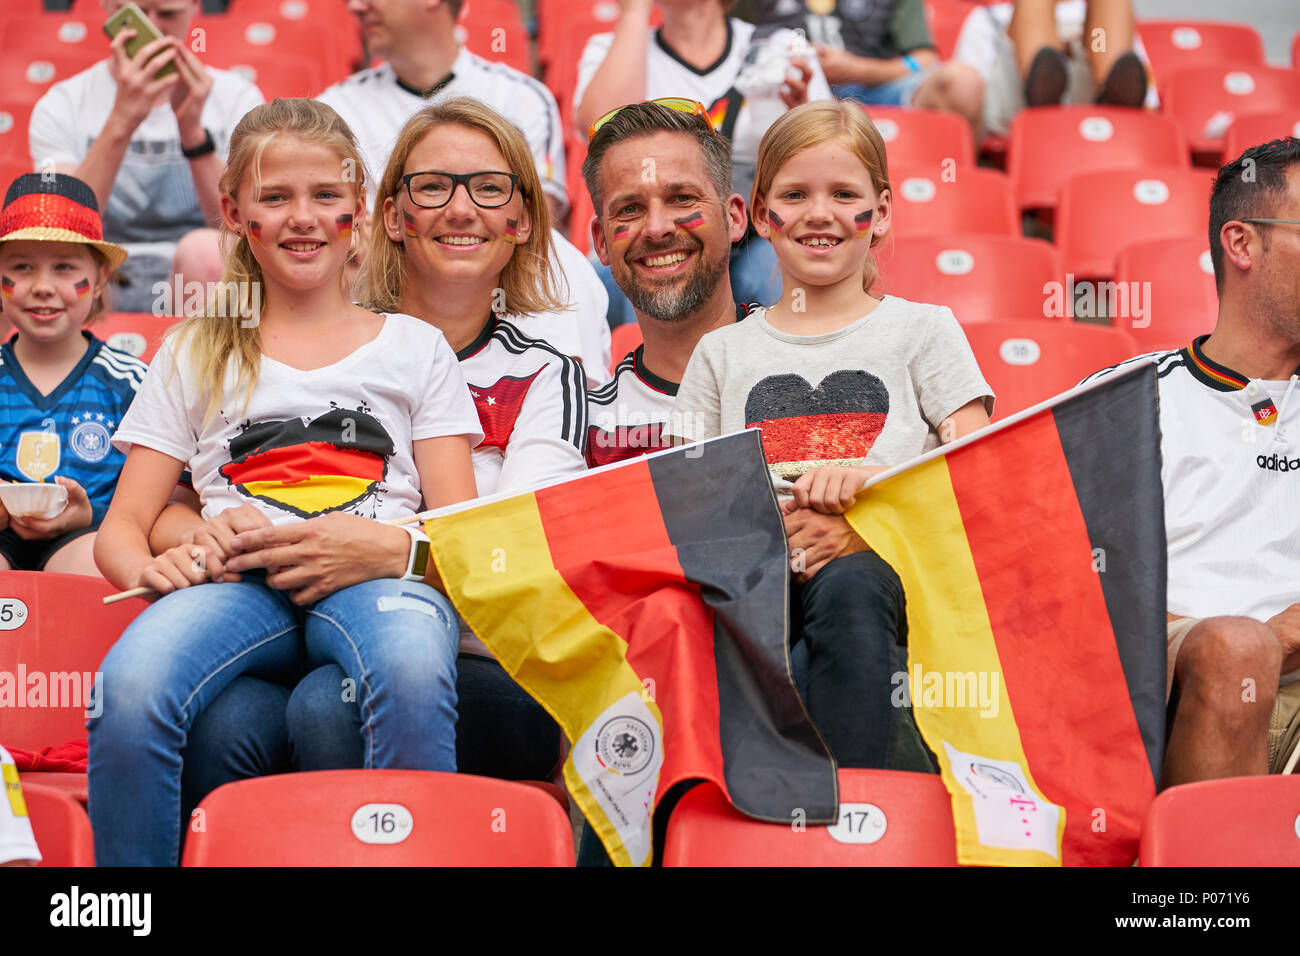 Leverkusen, Germany, 8 June 2018. Germany- Saudi Arabia, Soccer, Leverkusen, June 08, 2018 German fans colourful, family GERMANY - SAUDI ARABIA 2-1 friendly match,  German Football Nationalteam, DFB , Season 2017/2018,  June 08, 2018 in Leverkusen, Germany. © Peter Schatz / Alamy Live News Stock Photo